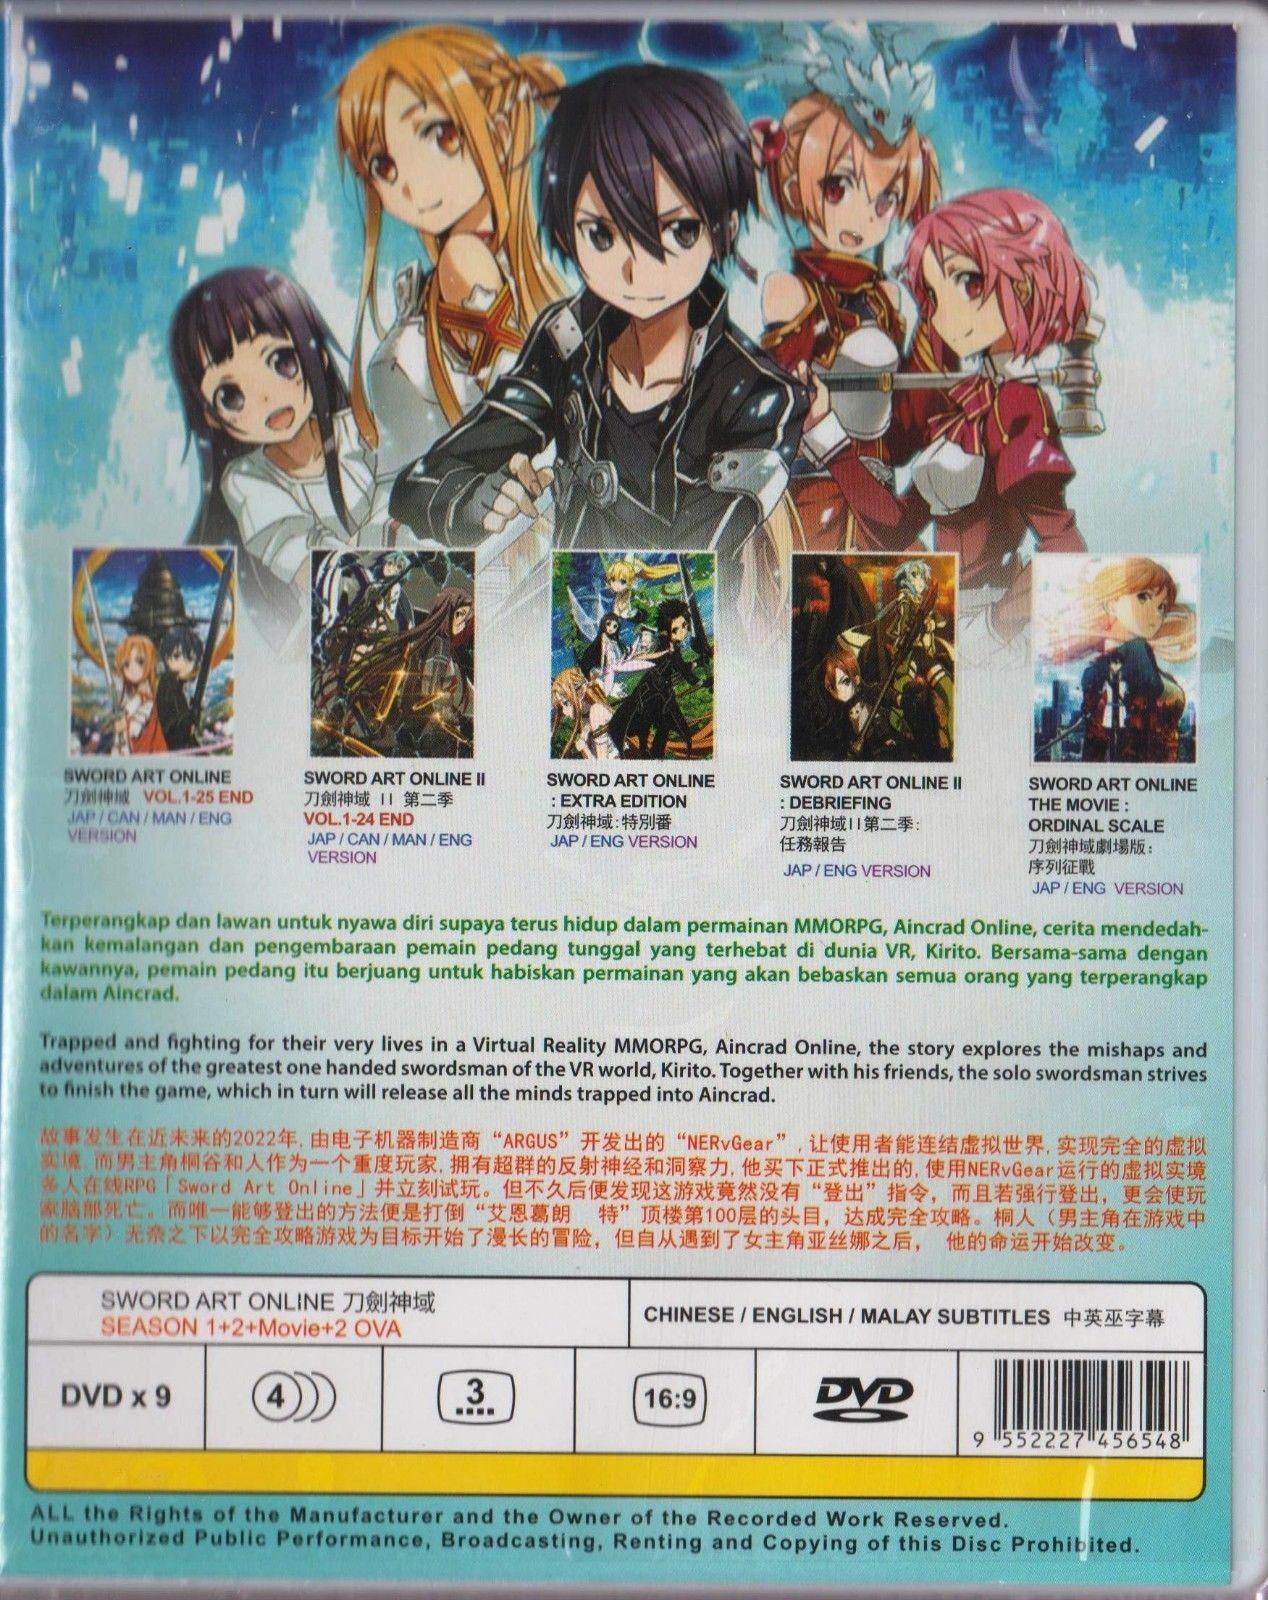 Anime DVD Sword Art Online Season 1+2 + and 50 similar items